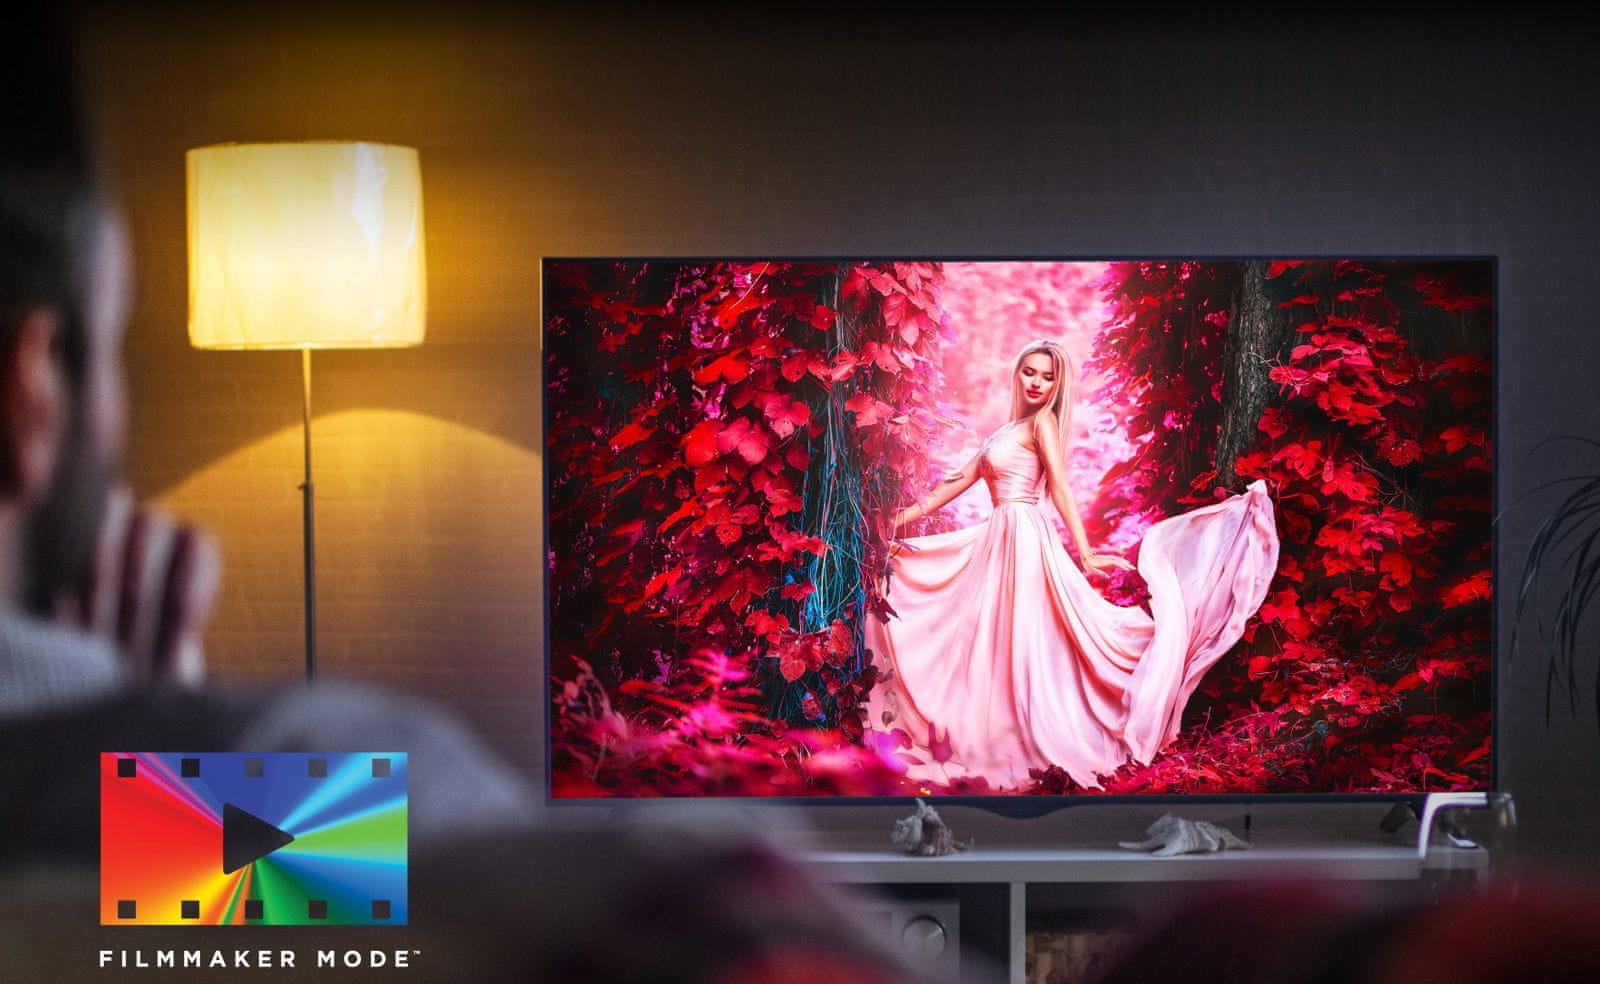 LG TV televizor NANOCELL 4K 2021 filmmaker mode james cameron christopher nolan martin scorsese